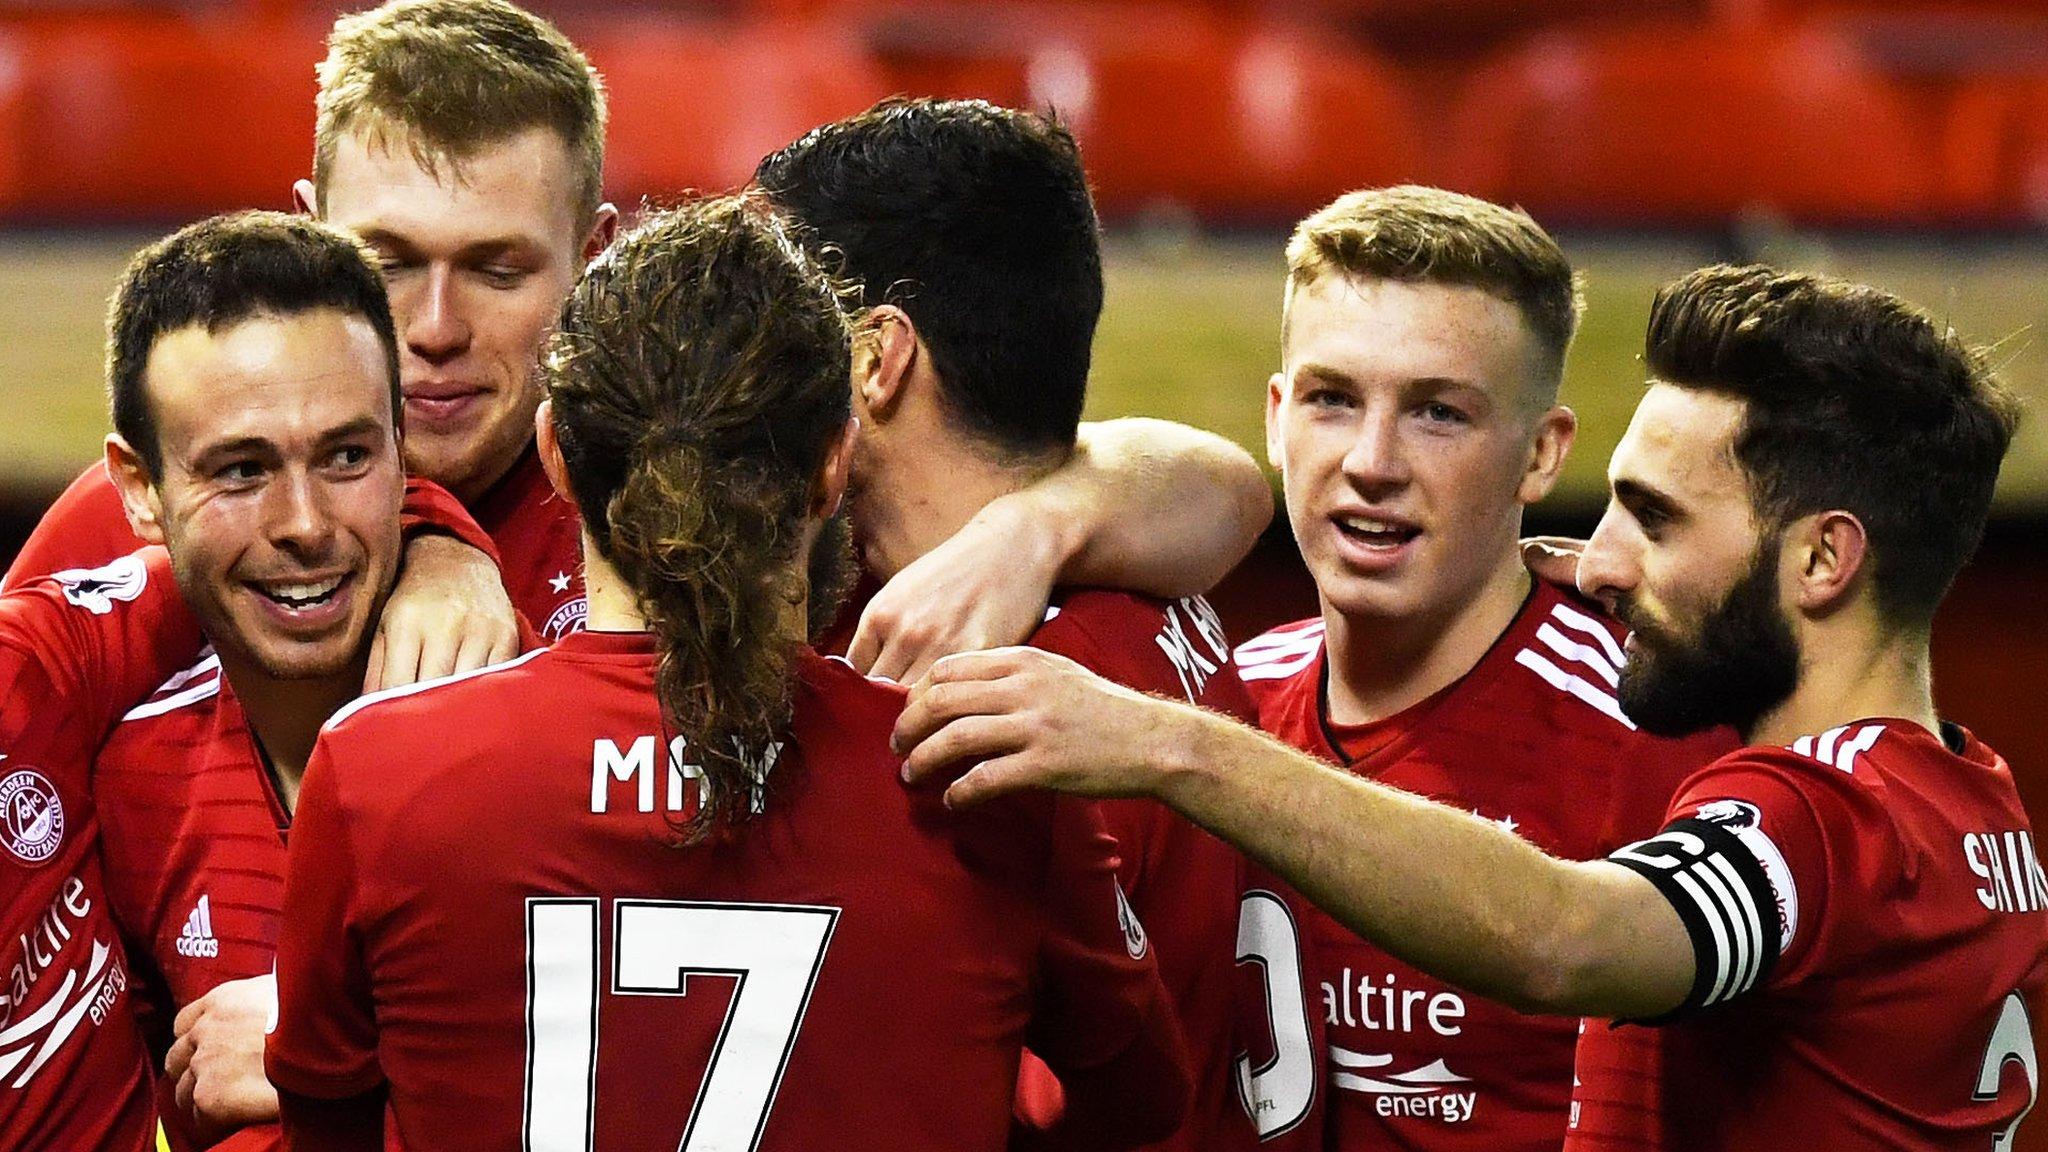 Aberdeen 5-1 Dundee: Cosgrove & Considine score twice in win